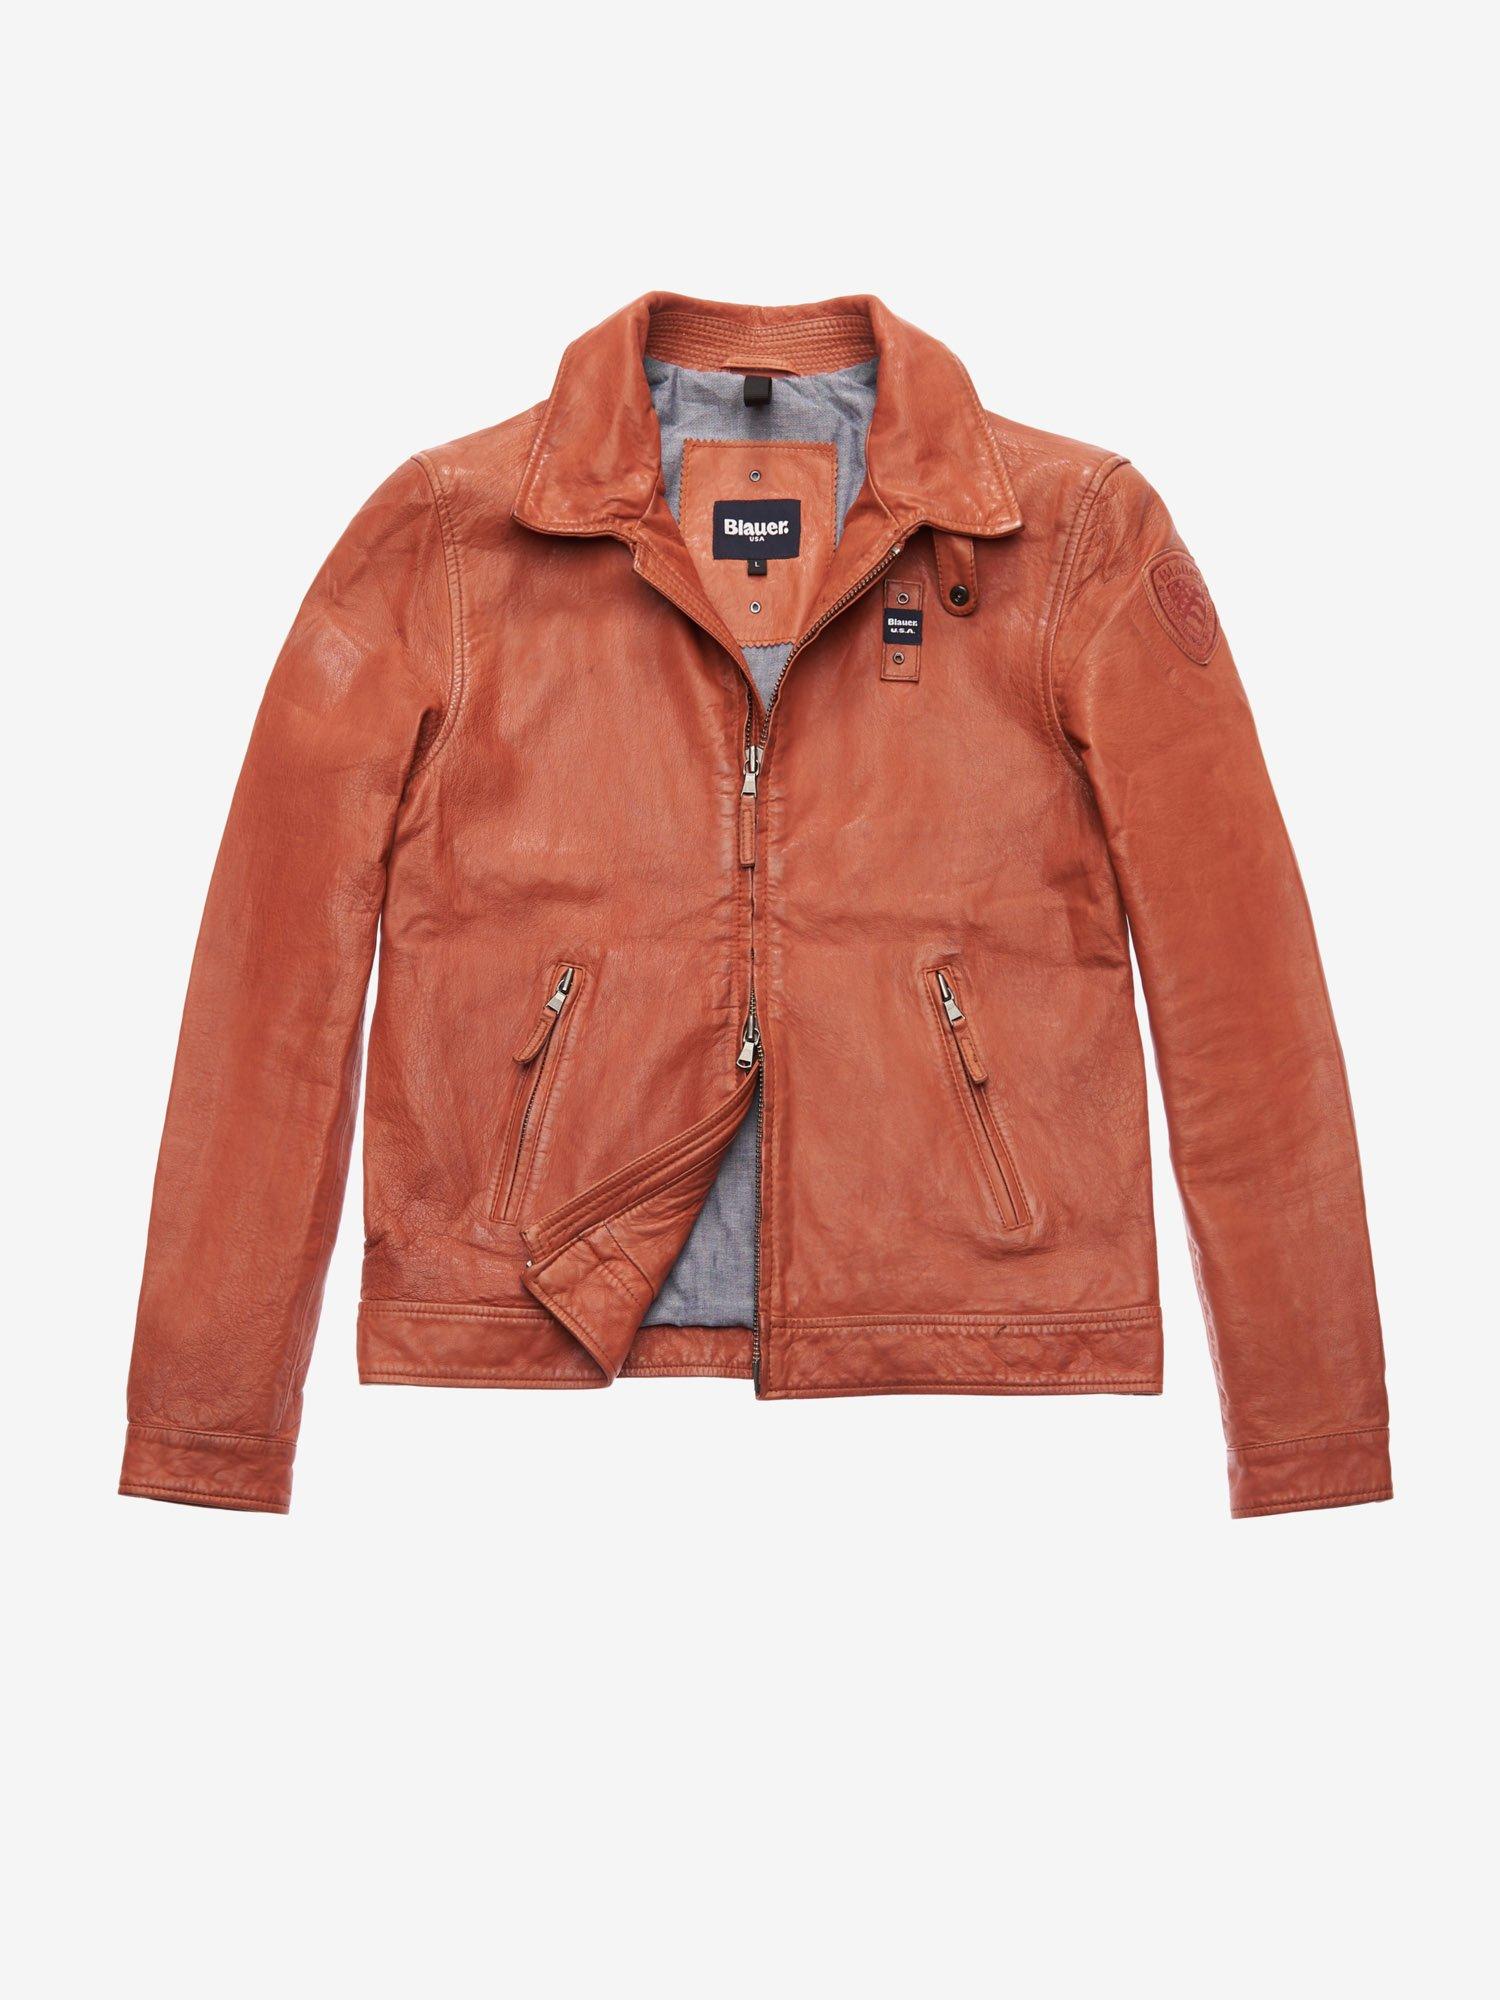 056114f187 Giubbotti e Giacche Pelle Uomo Blauer ® - Shop Online   Blauer USA